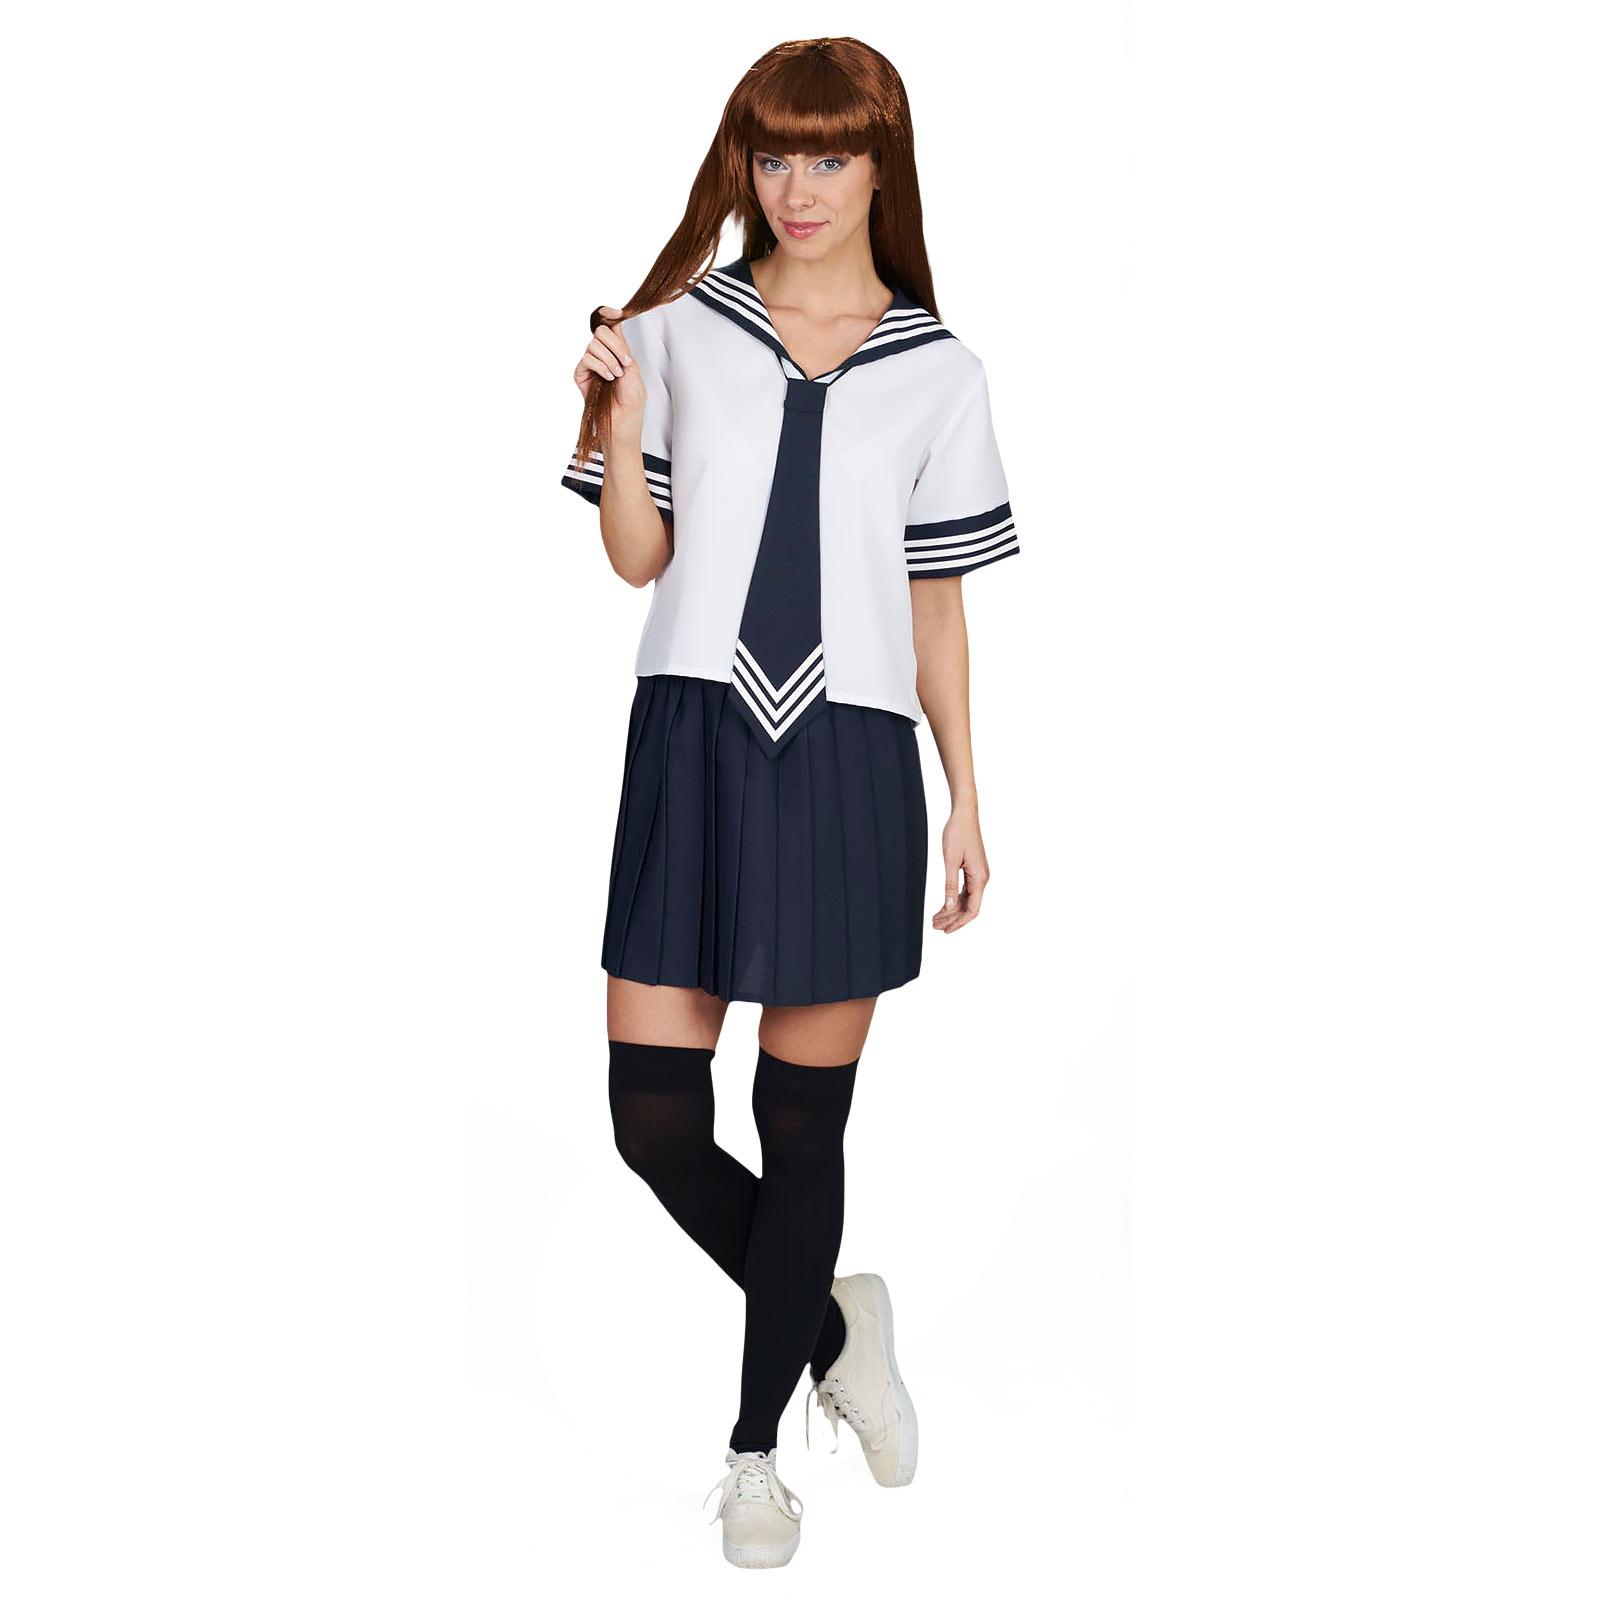 Cosplay - Sailor Girl Kostüm Damen